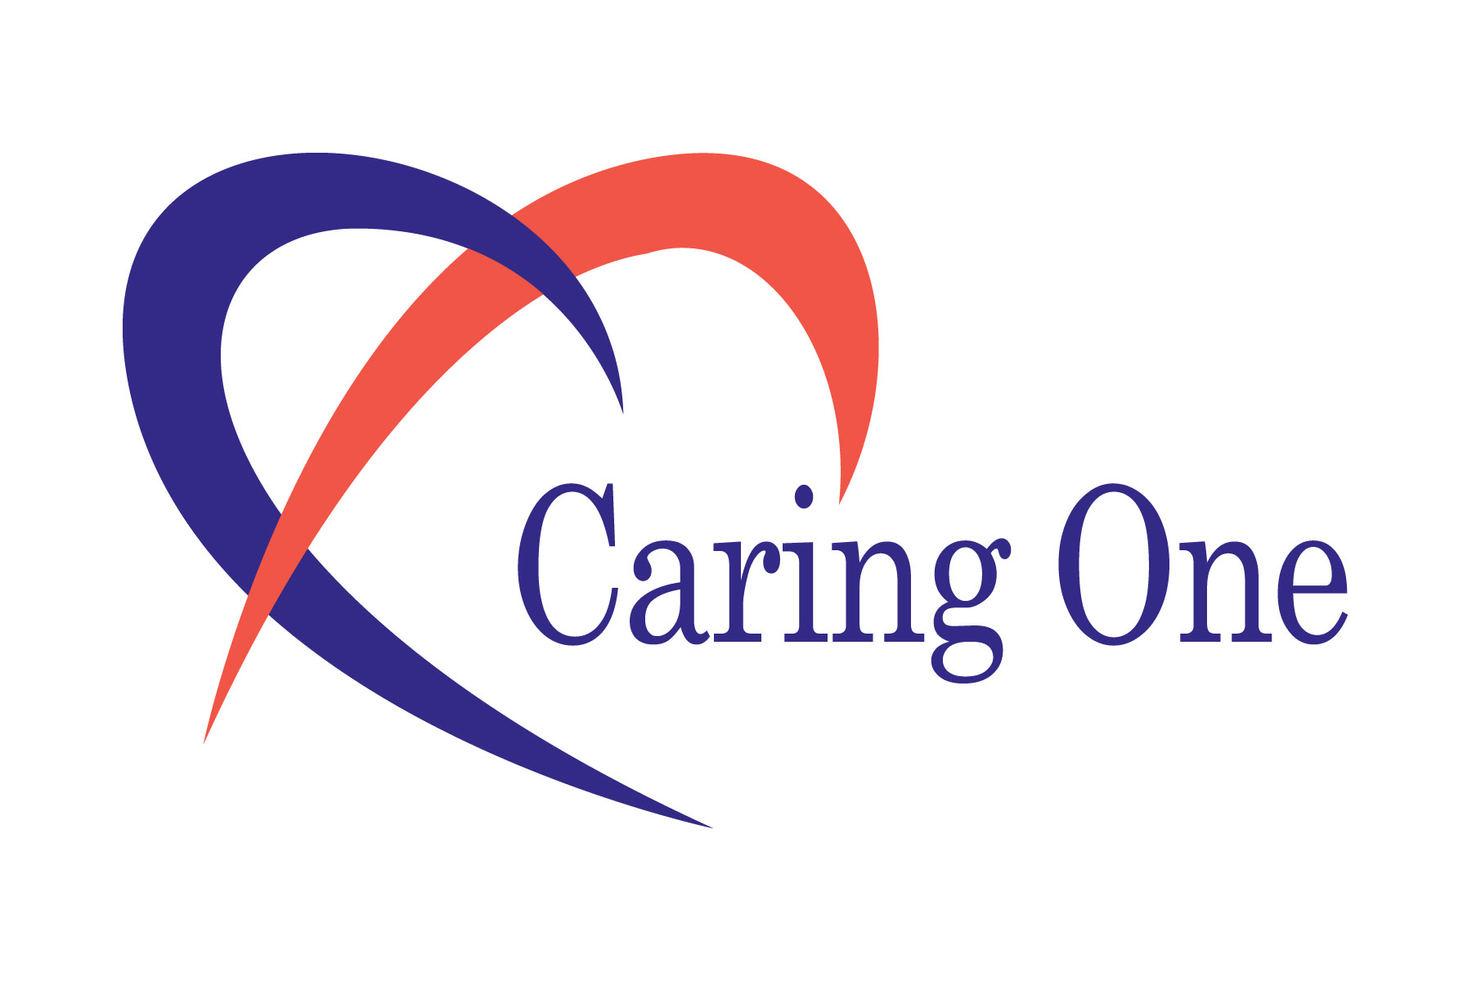 caring_one_logo.jpg